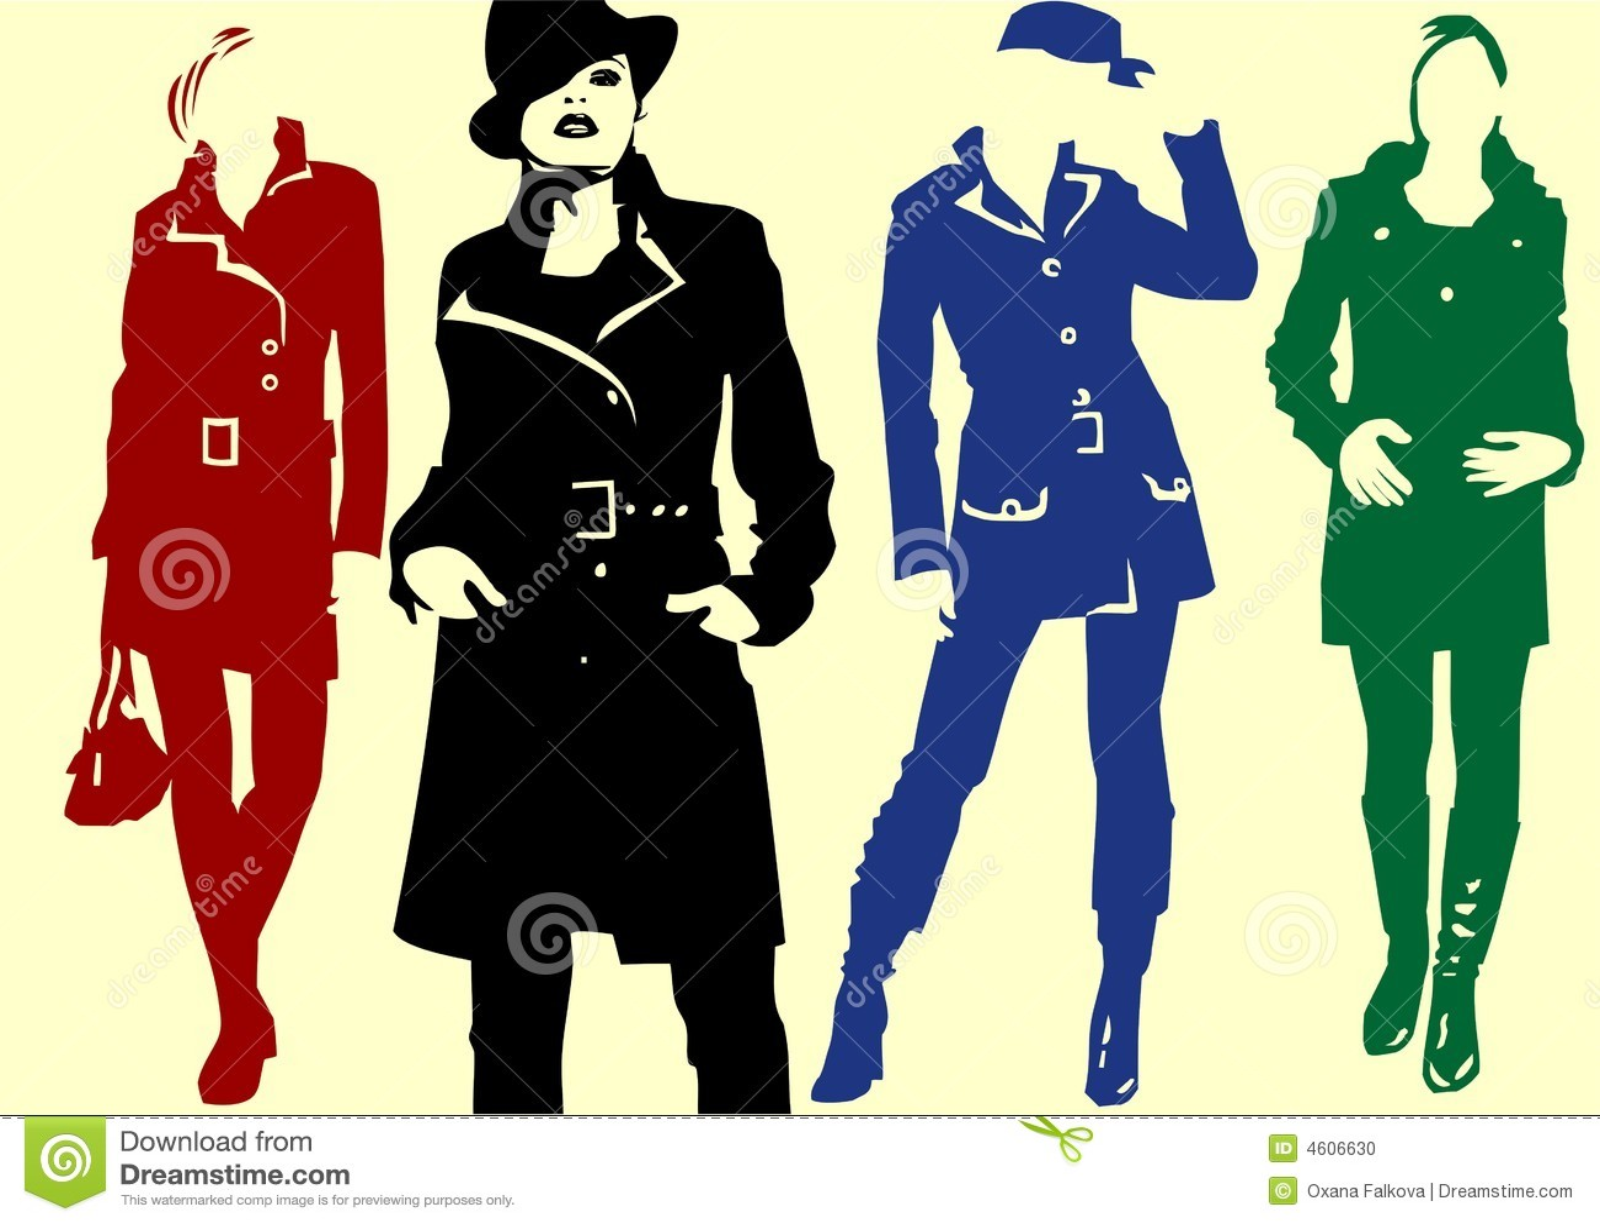 Fashion Vector Stock Vector. Image Of Fashion, Person